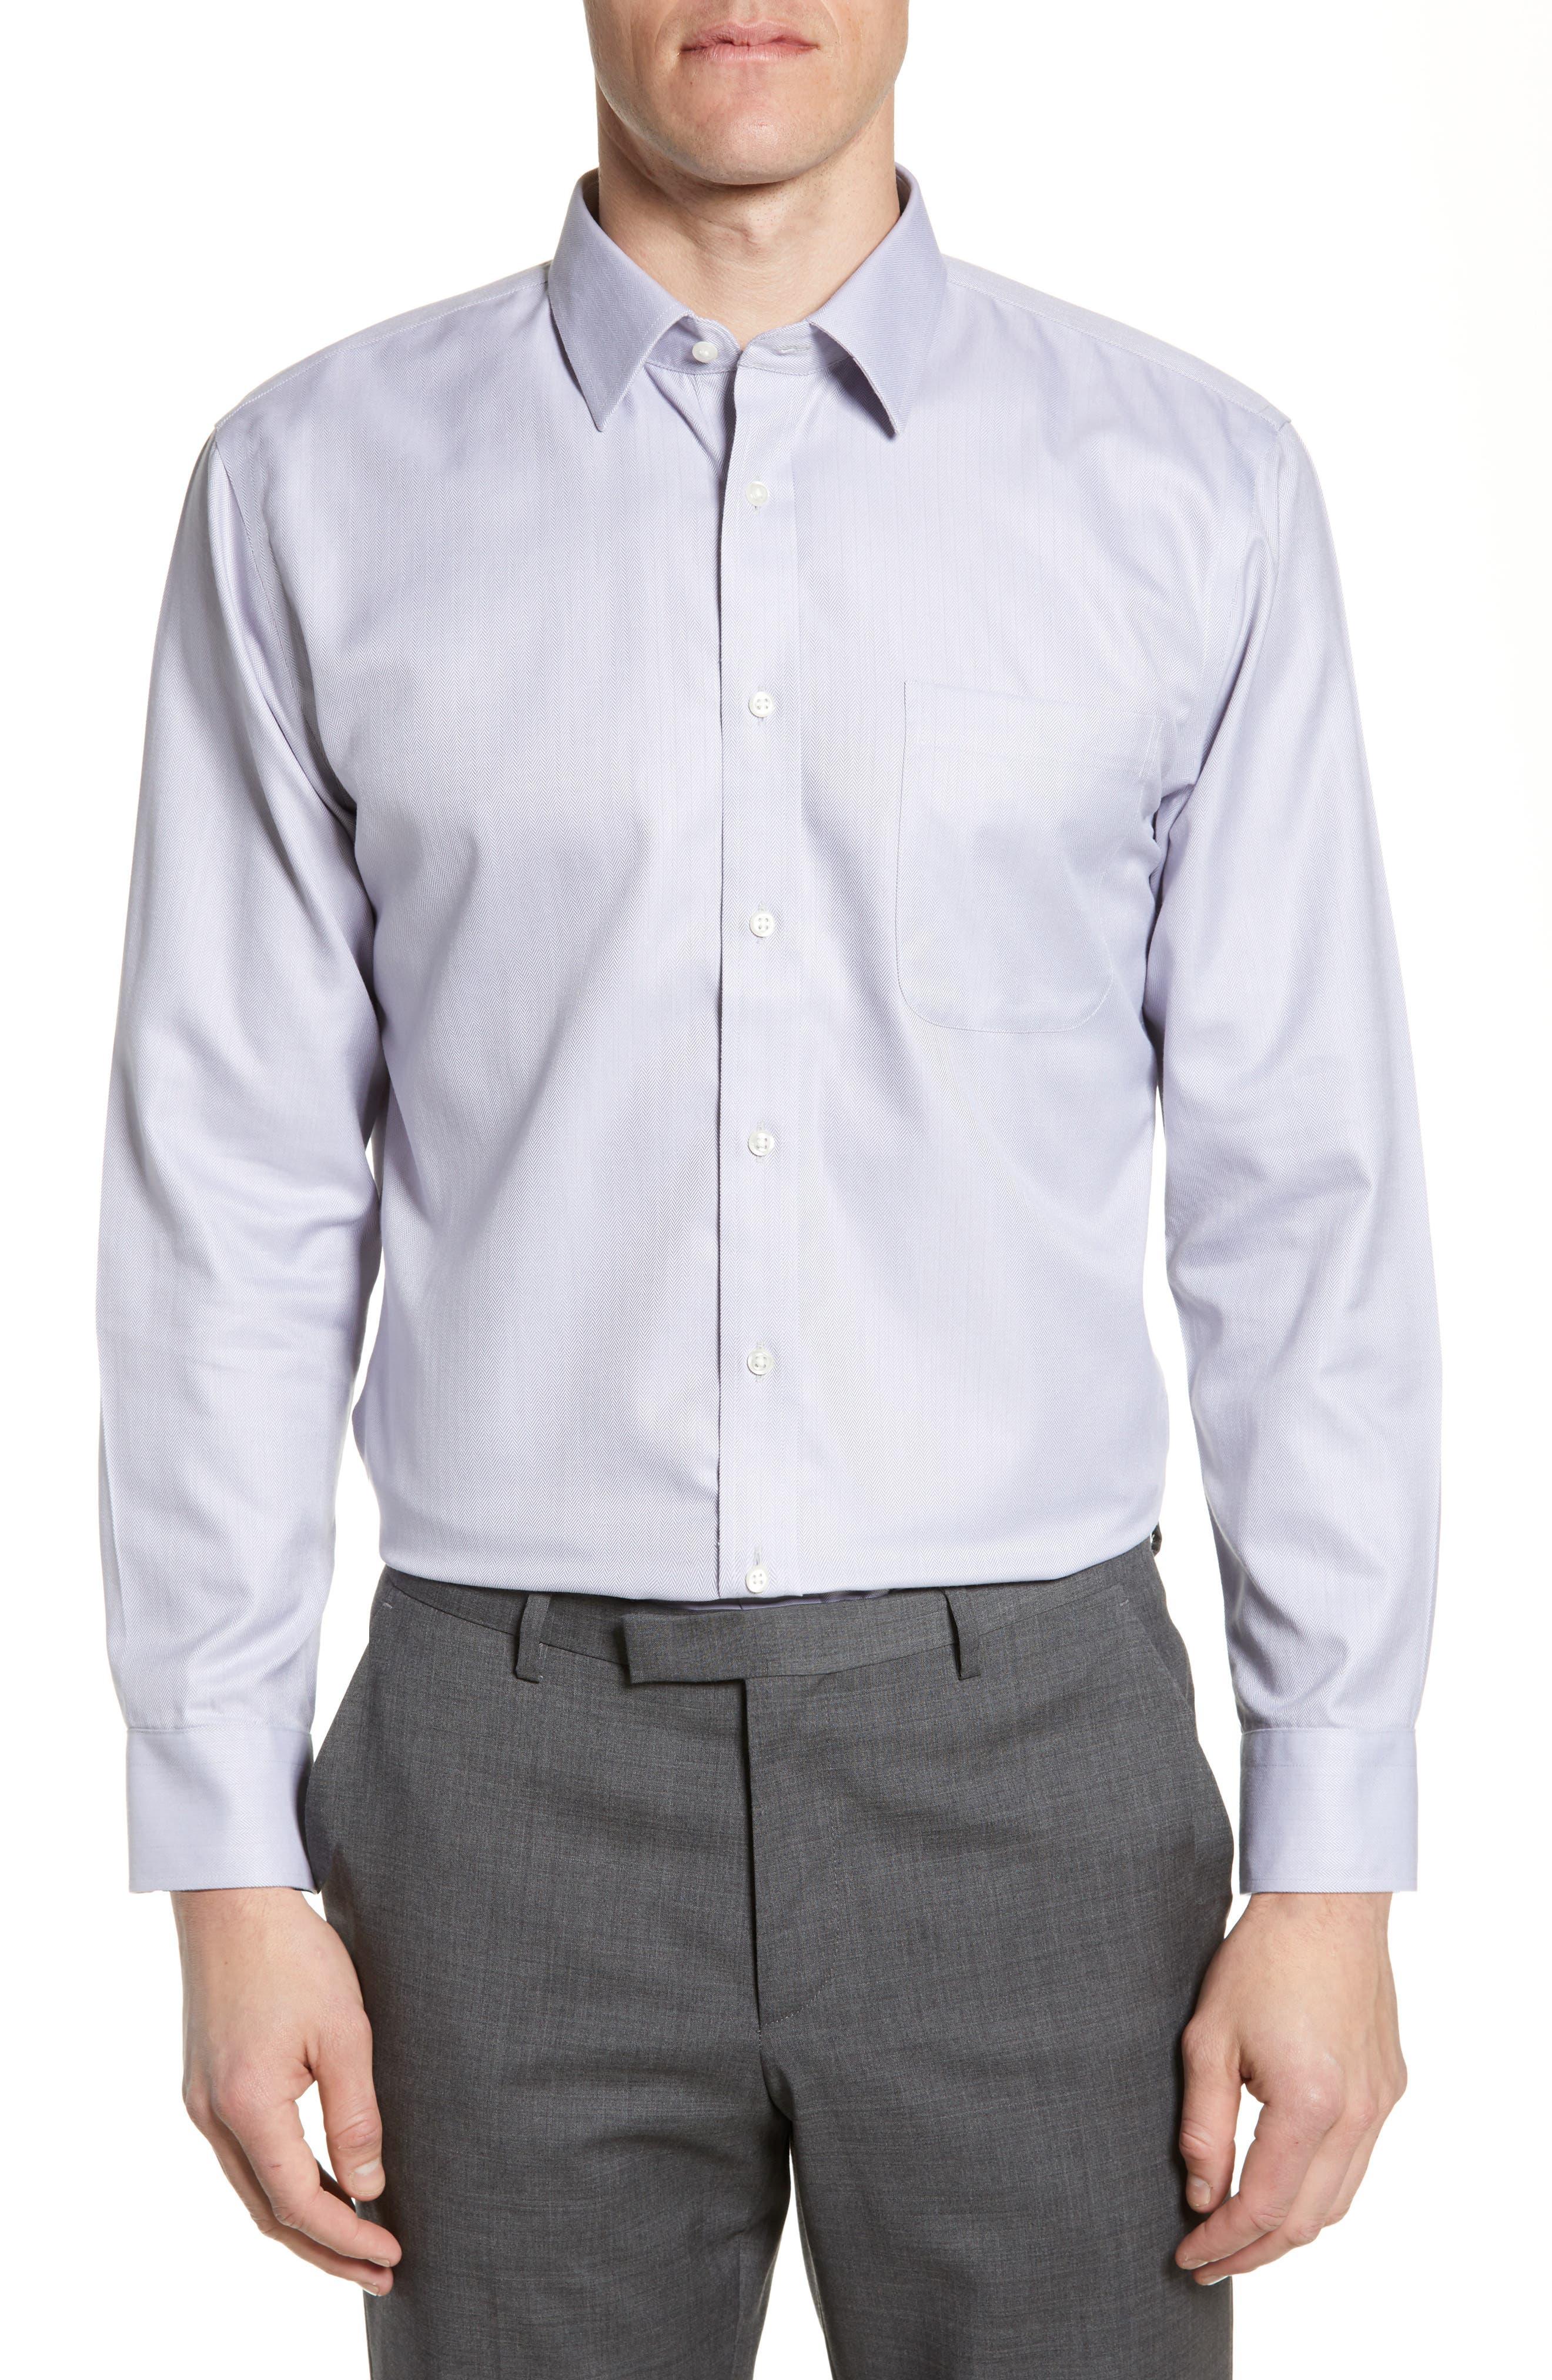 Nordstrom Shop Smartcare(TM) Trim Fit Herringbone Dress Shirt - Grey